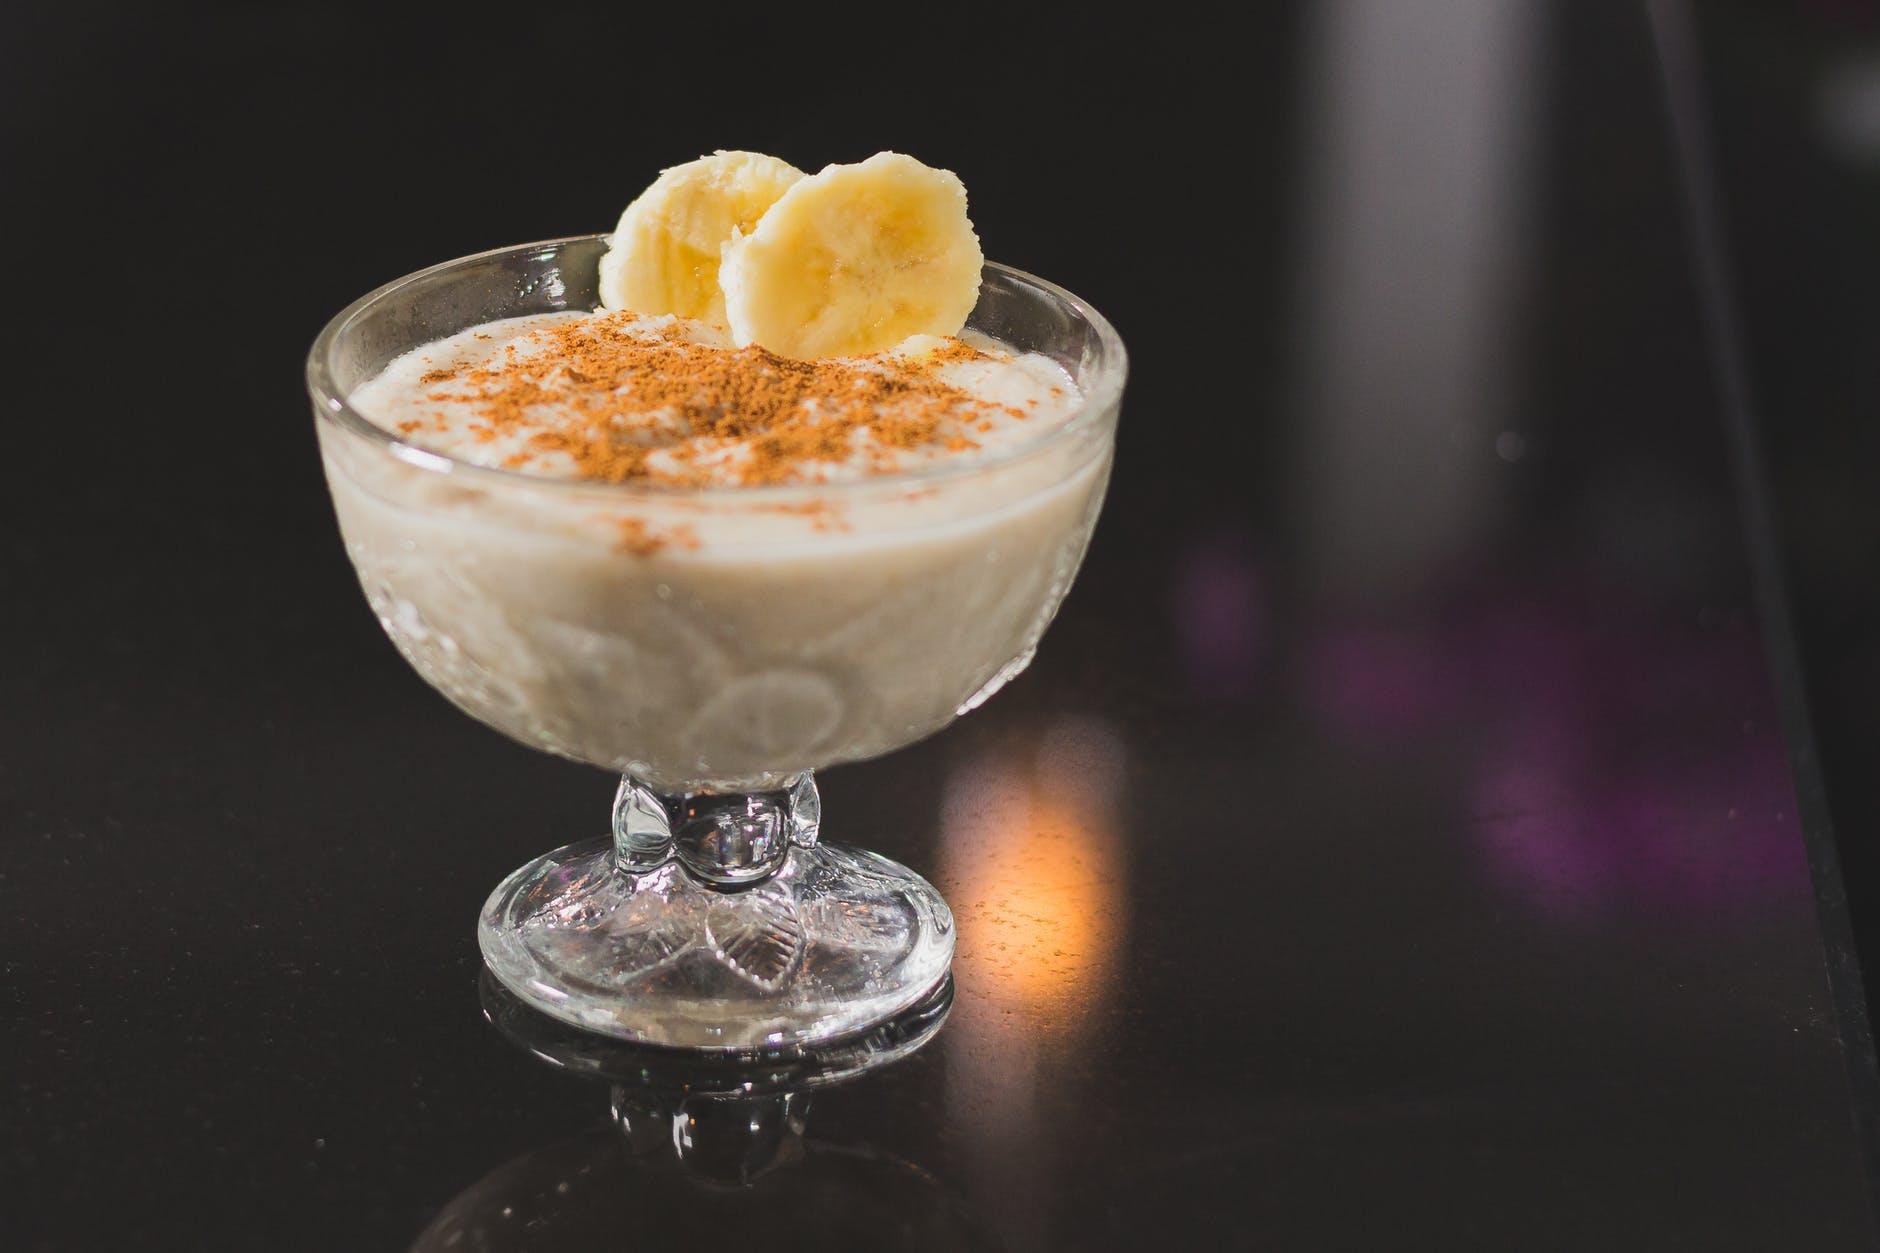 close up photo of dessert